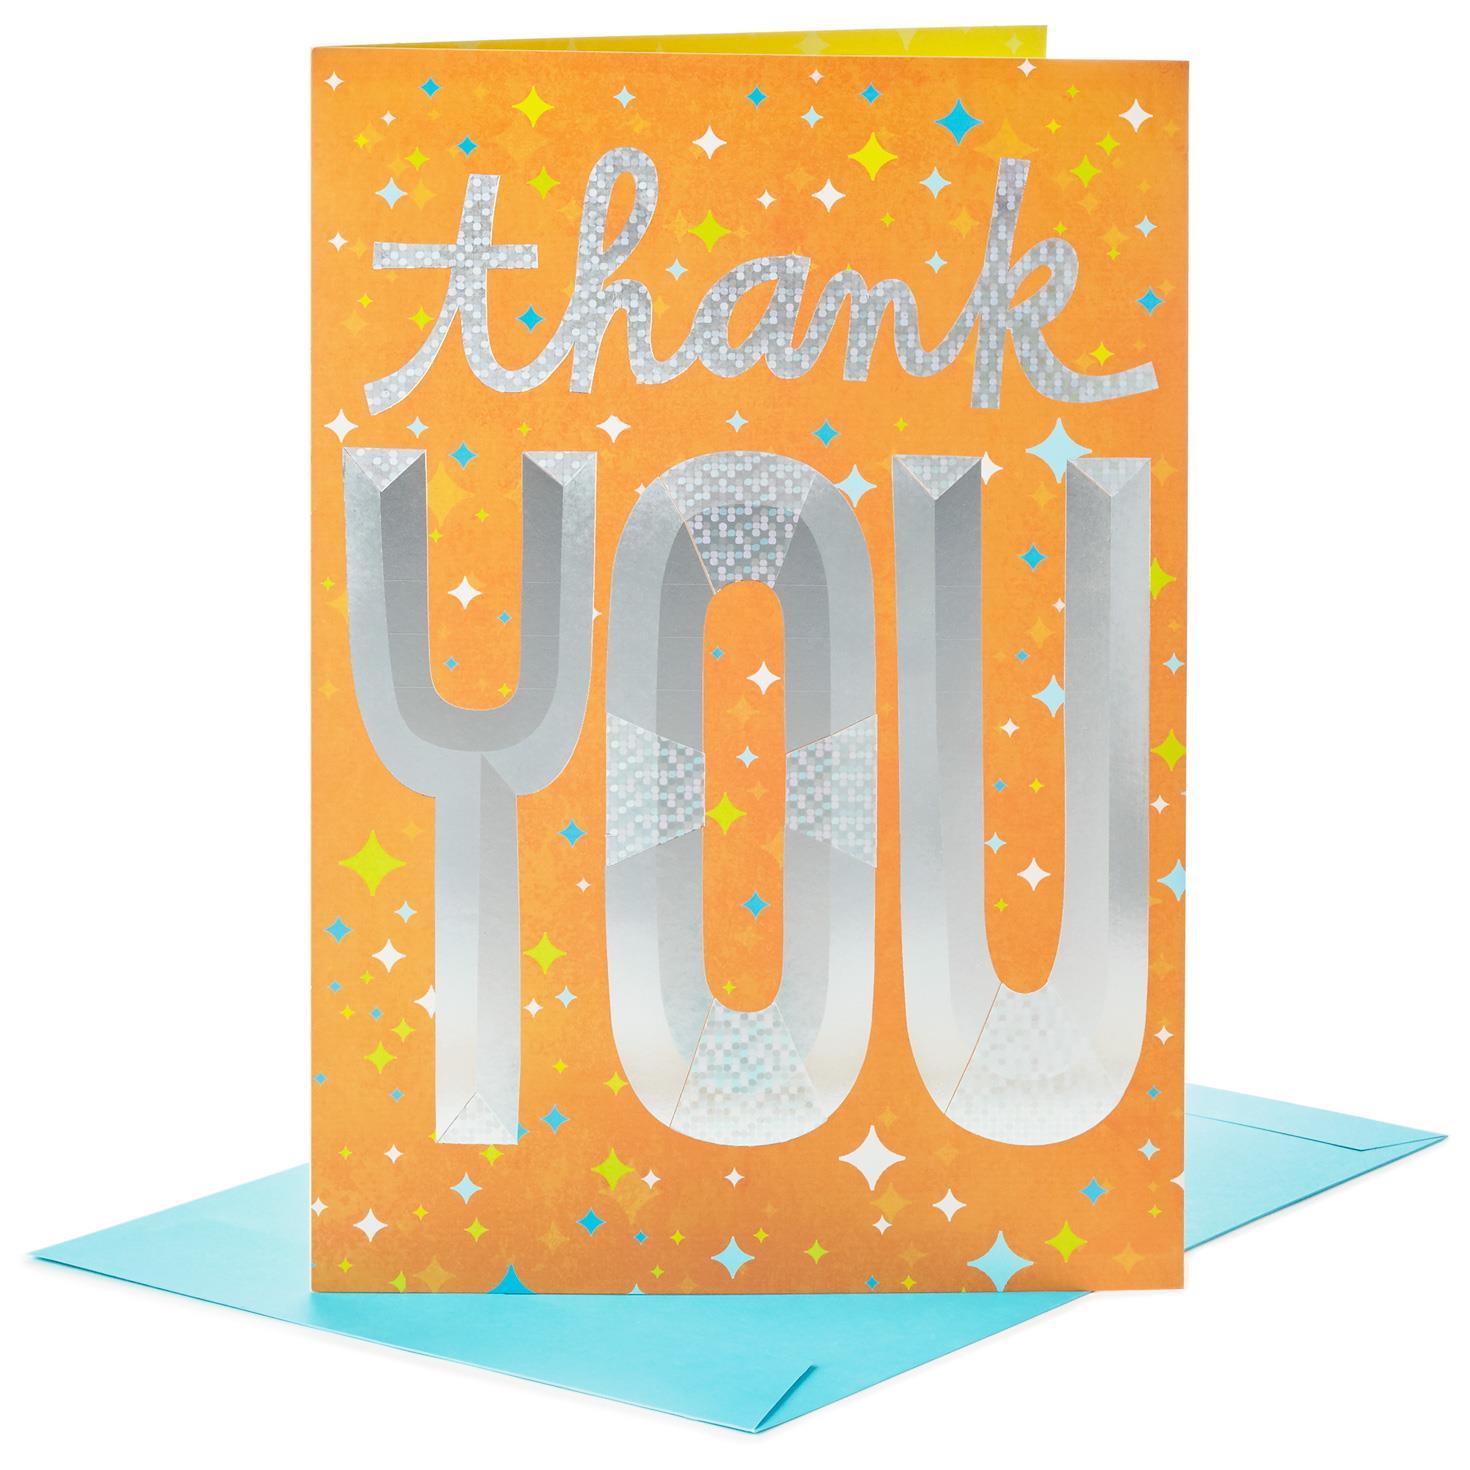 Big thanks to you jumbo thank you card 16 greeting cards hallmark big thanks to you jumbo thank you card 16 m4hsunfo